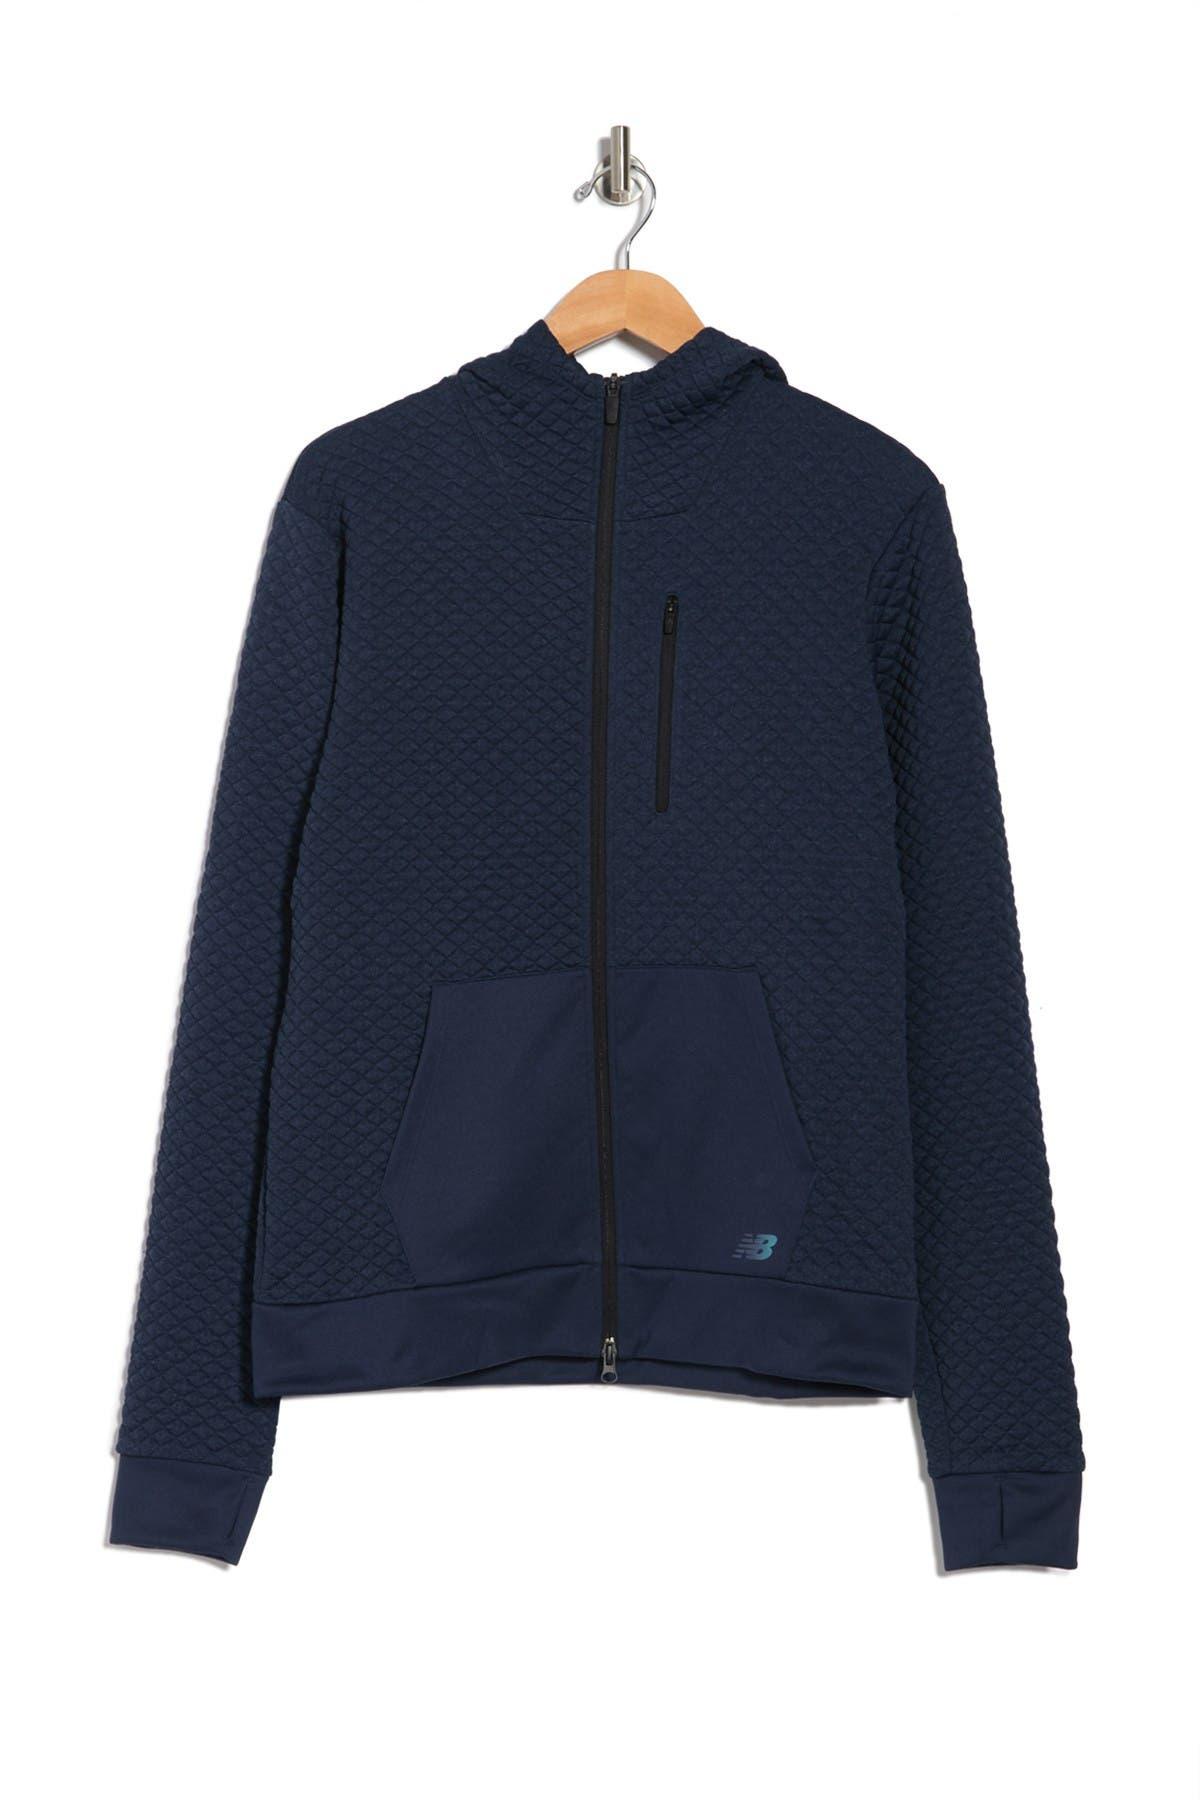 Image of New Balance Heat Loft Full Zip Jacket